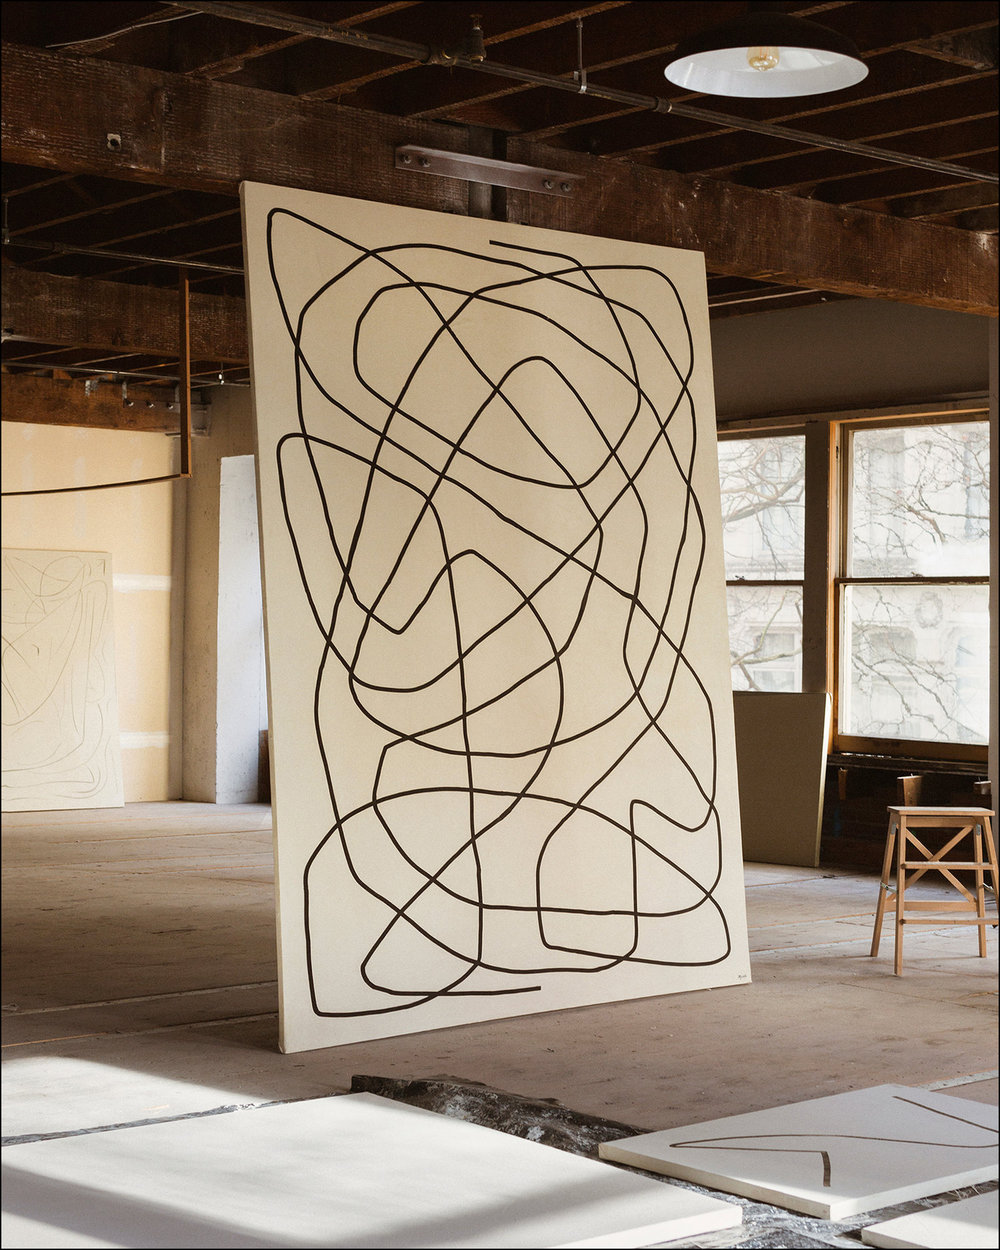 Common  - 2018 - Acrylic on Canvas -75 X 114 Inches (190.5 X 289.5cm)